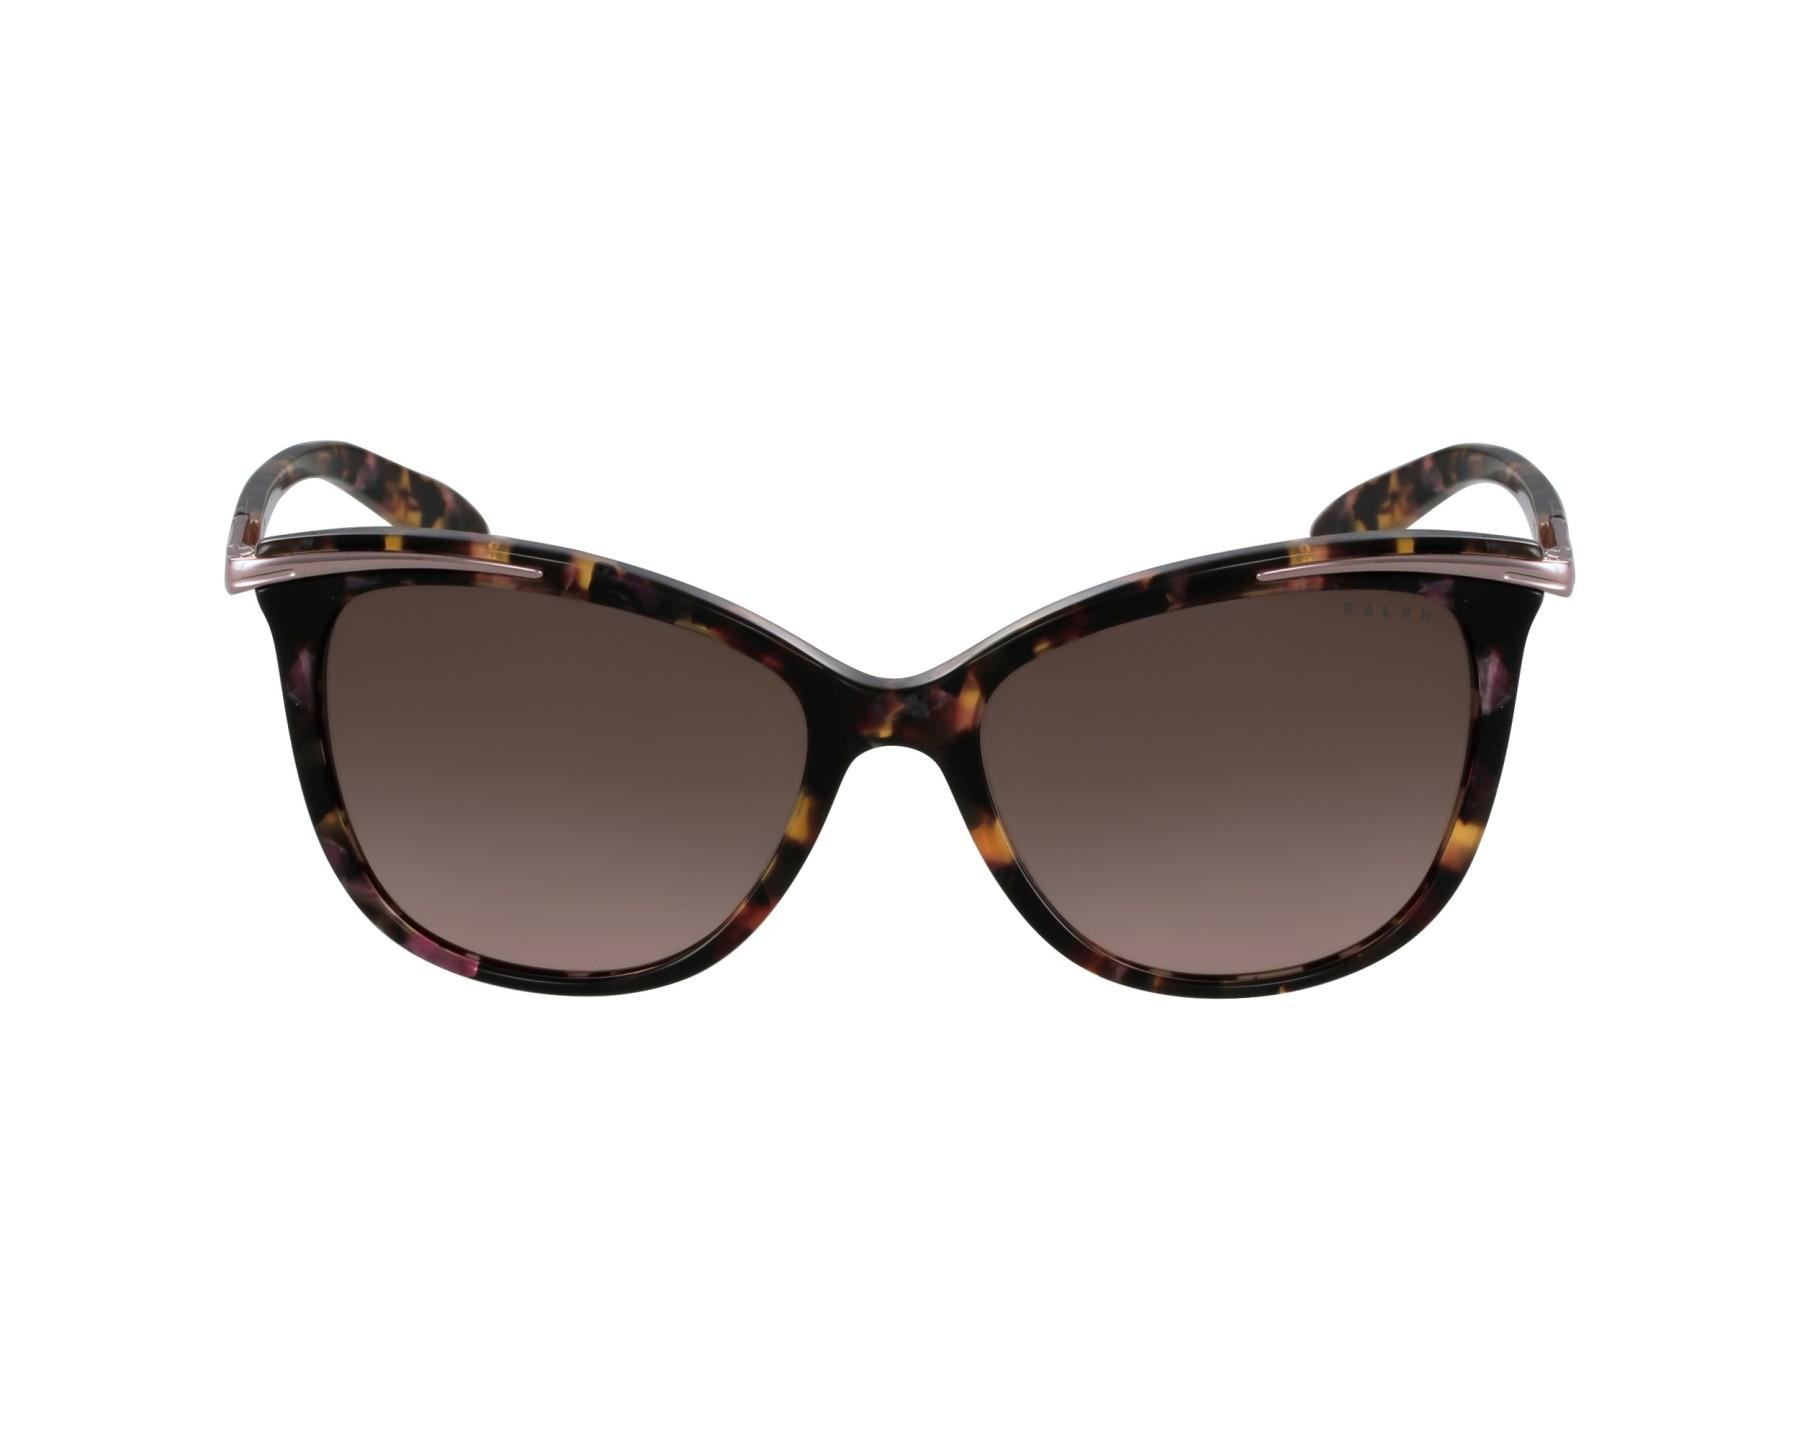 lunettes de soleil ralph lauren ra 5203 146114 rose avec des verres prune. Black Bedroom Furniture Sets. Home Design Ideas